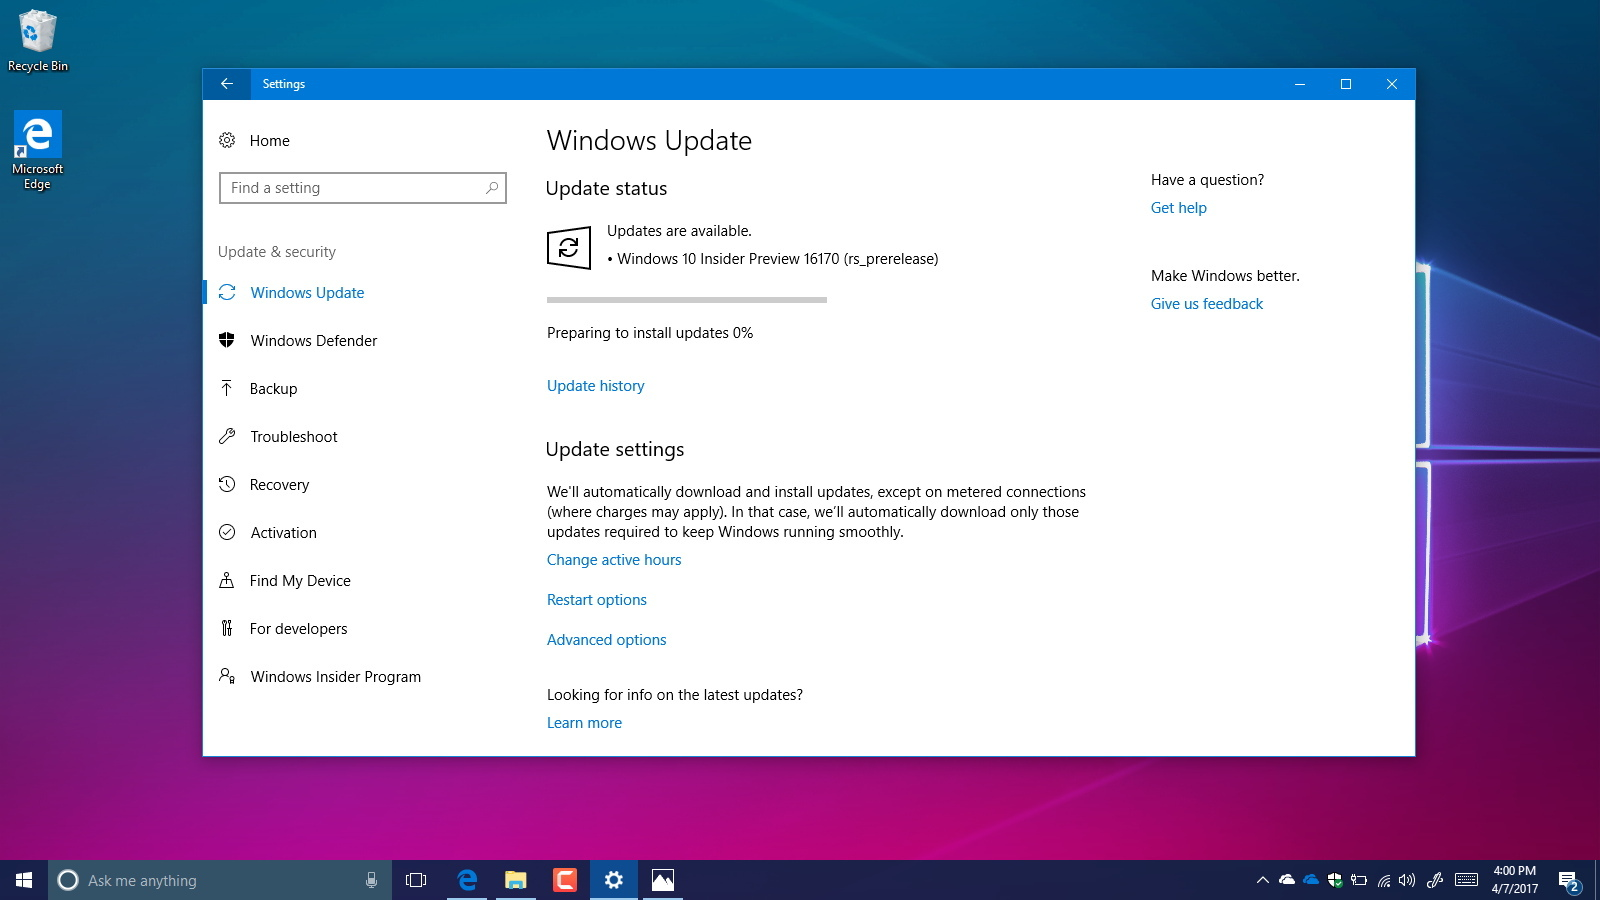 Windows 10 build 16170